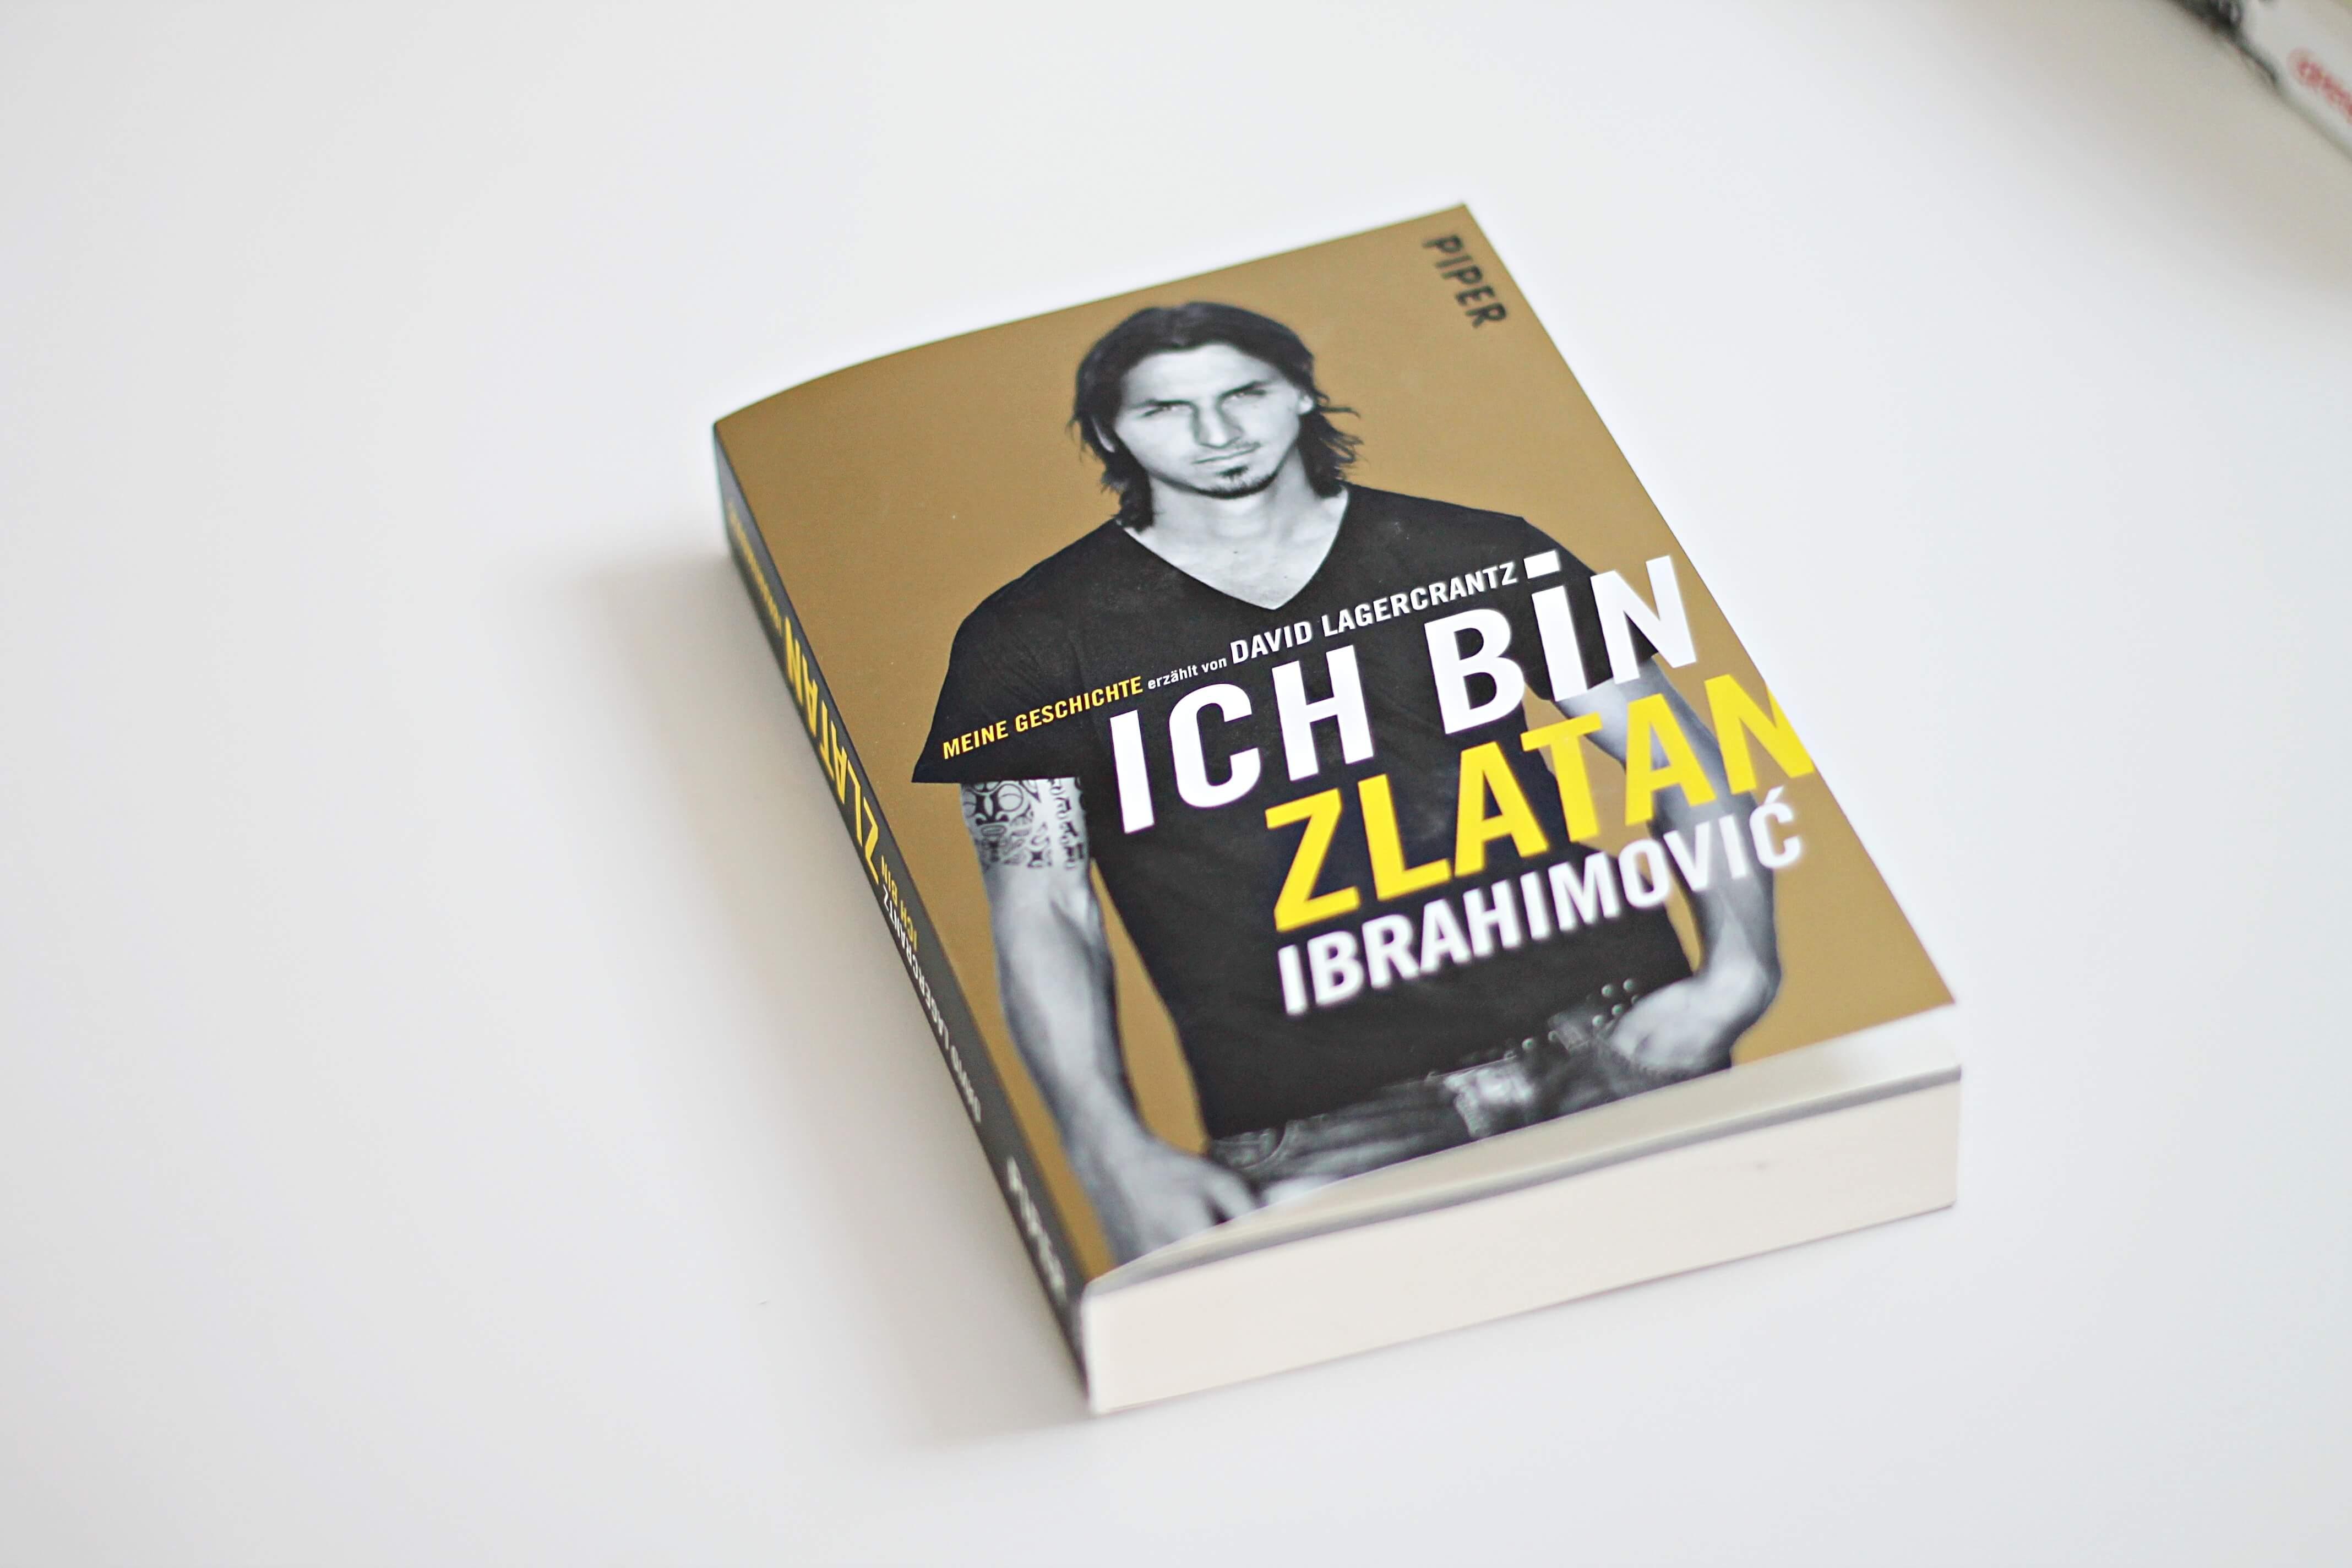 zlatan-ibrahimovic-biografie-buchtipps-blogger